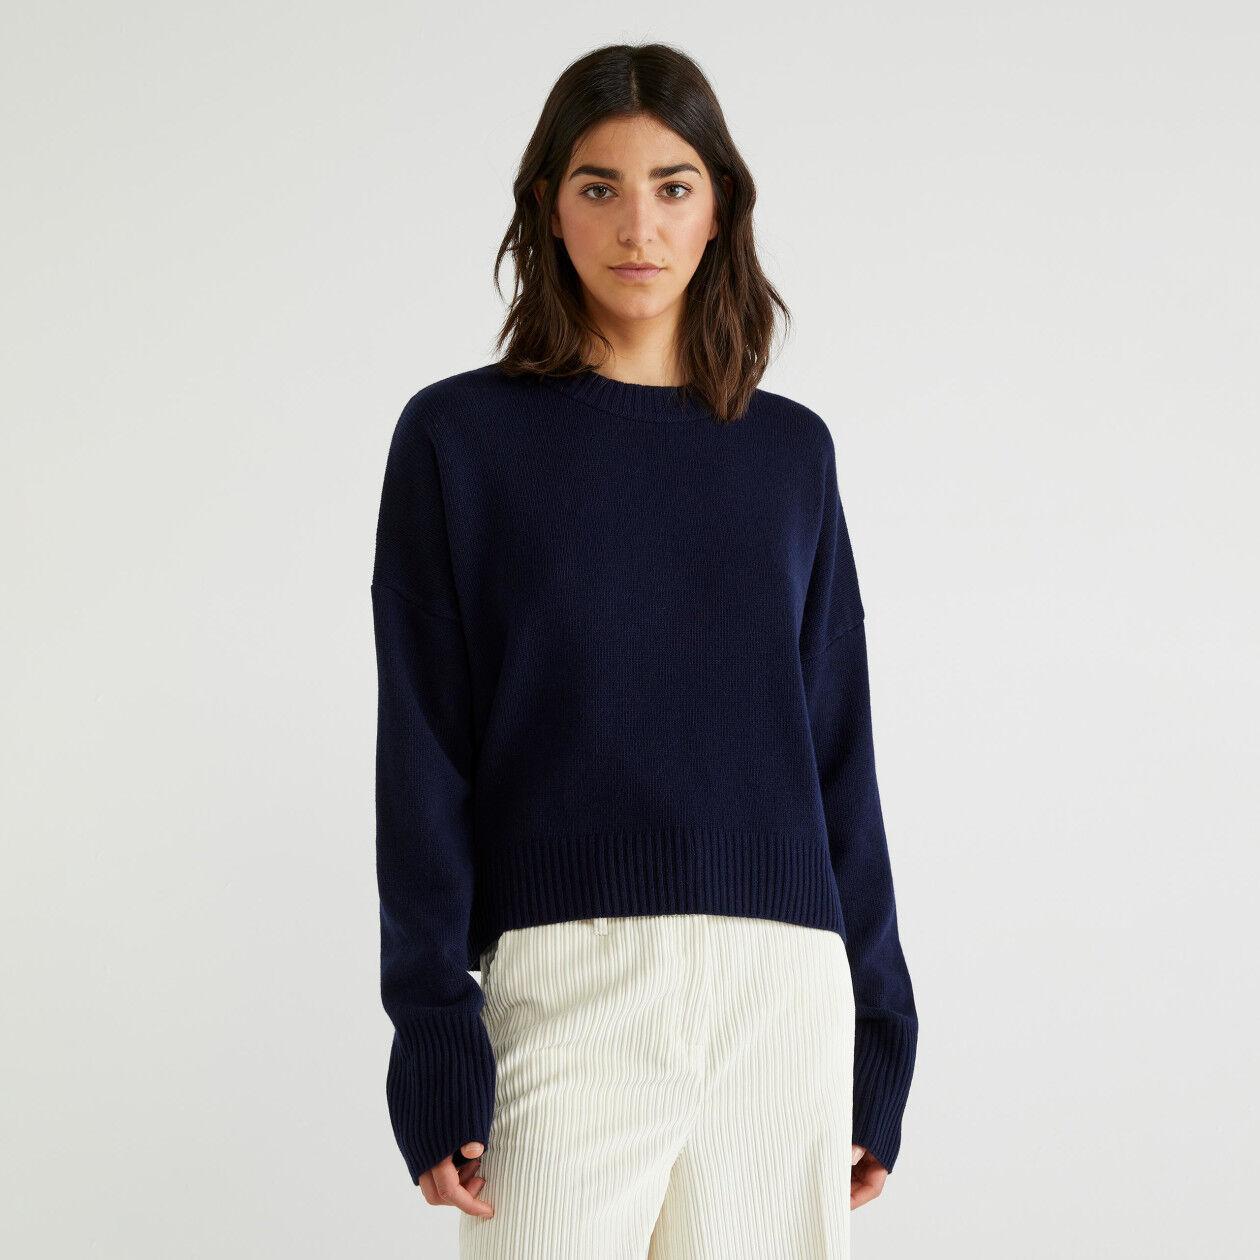 Maglia girocollo in lana